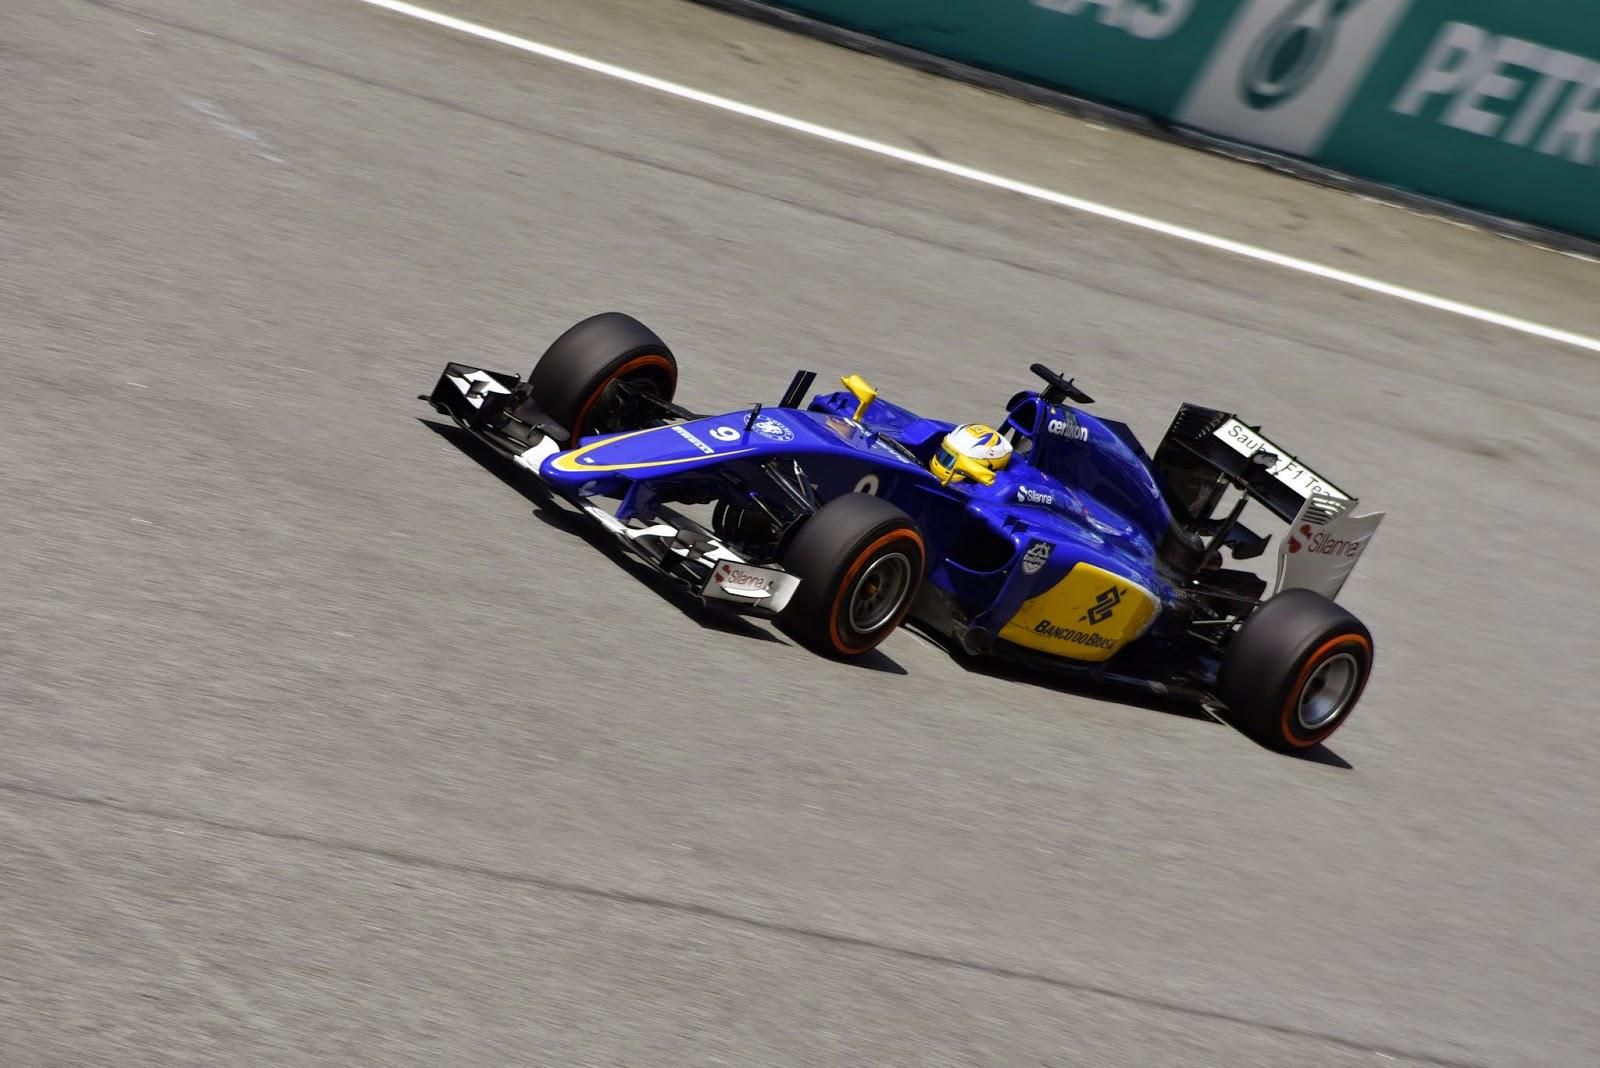 Sauber F1 Motorsport picture in Malaysia